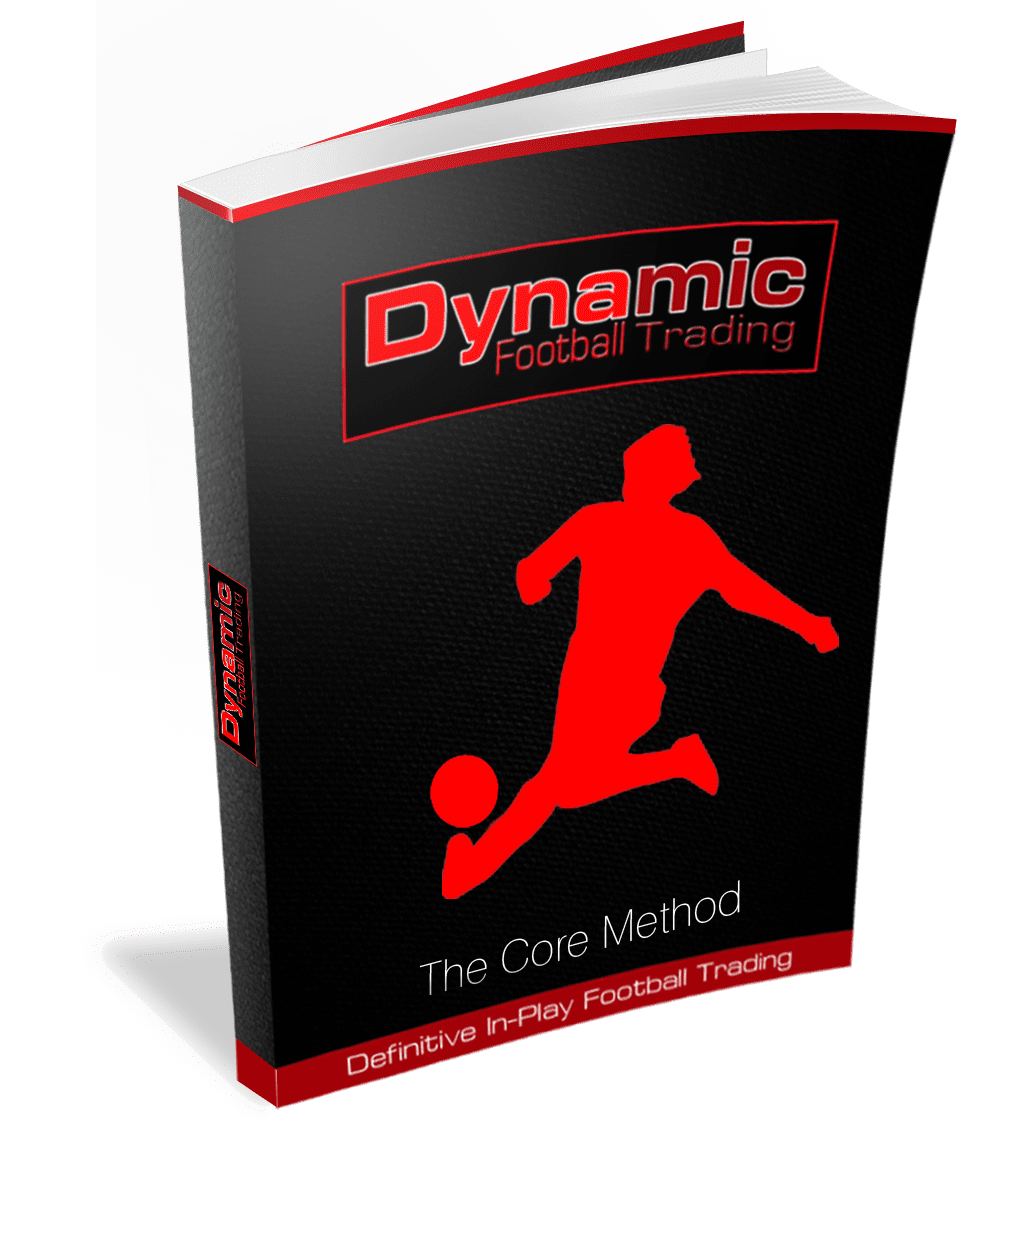 Inplay football trading strategies